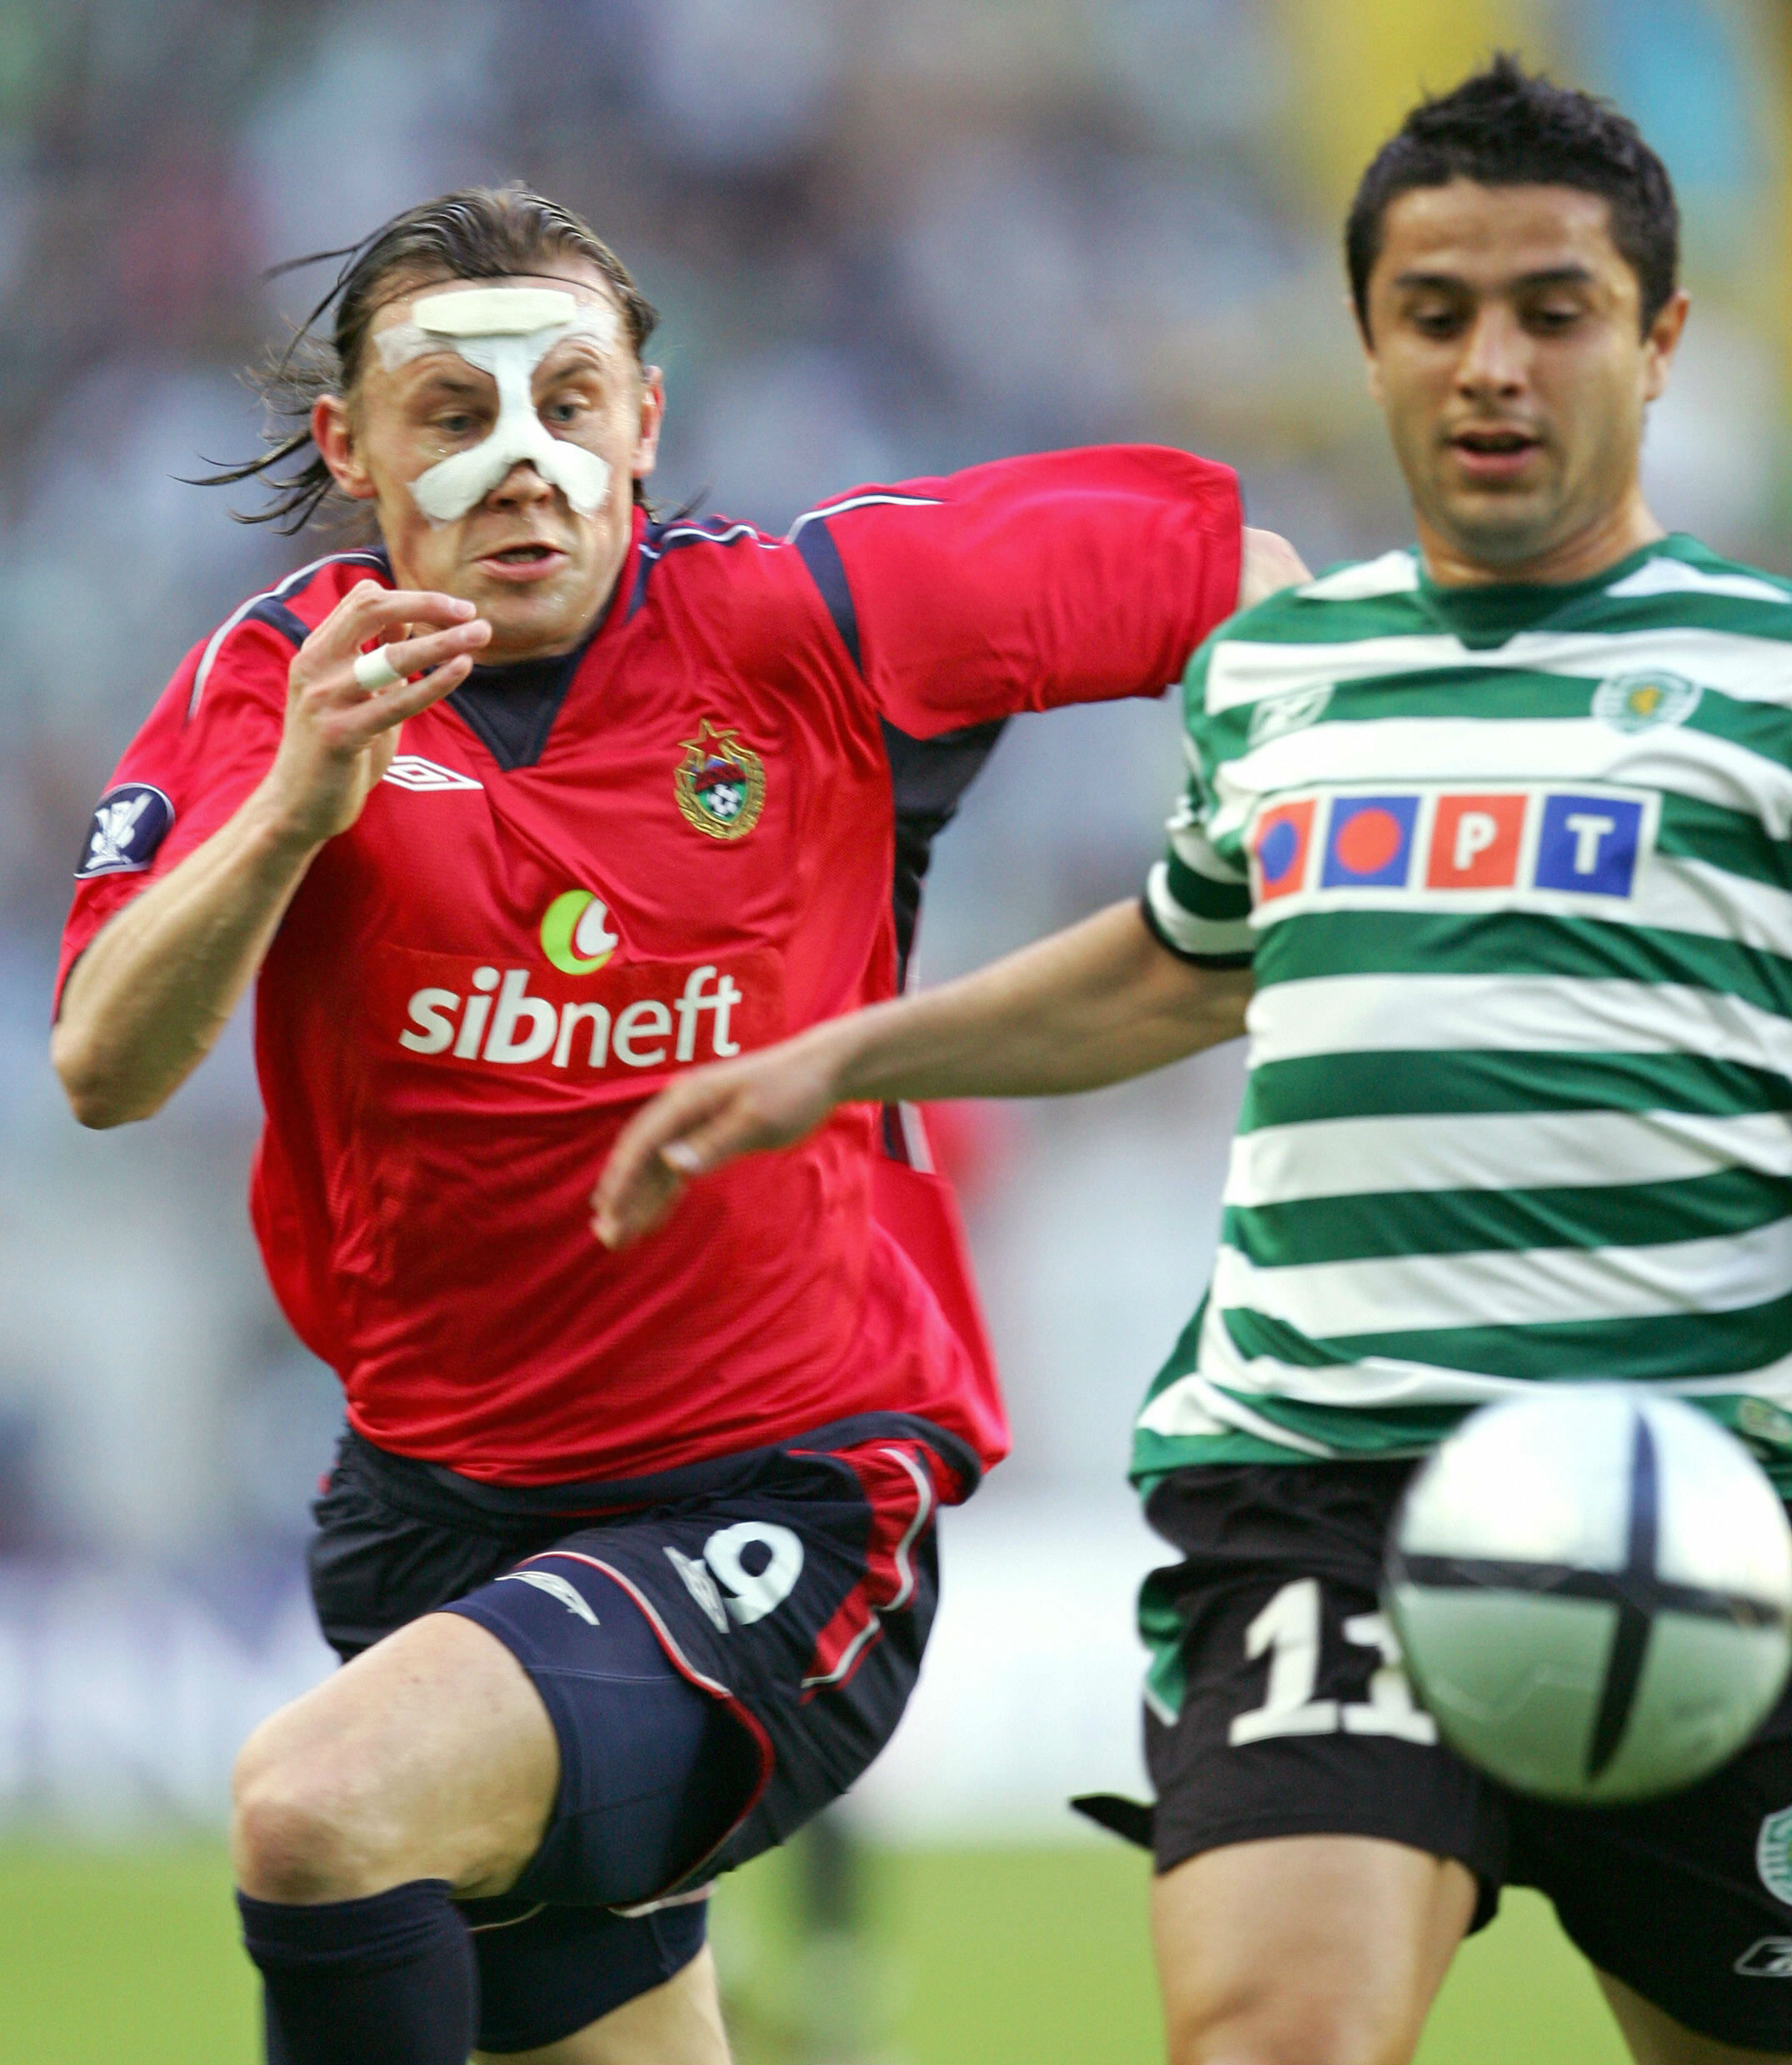 ivica olic - cska 3 sporting 1 - uefa cup final - 2005